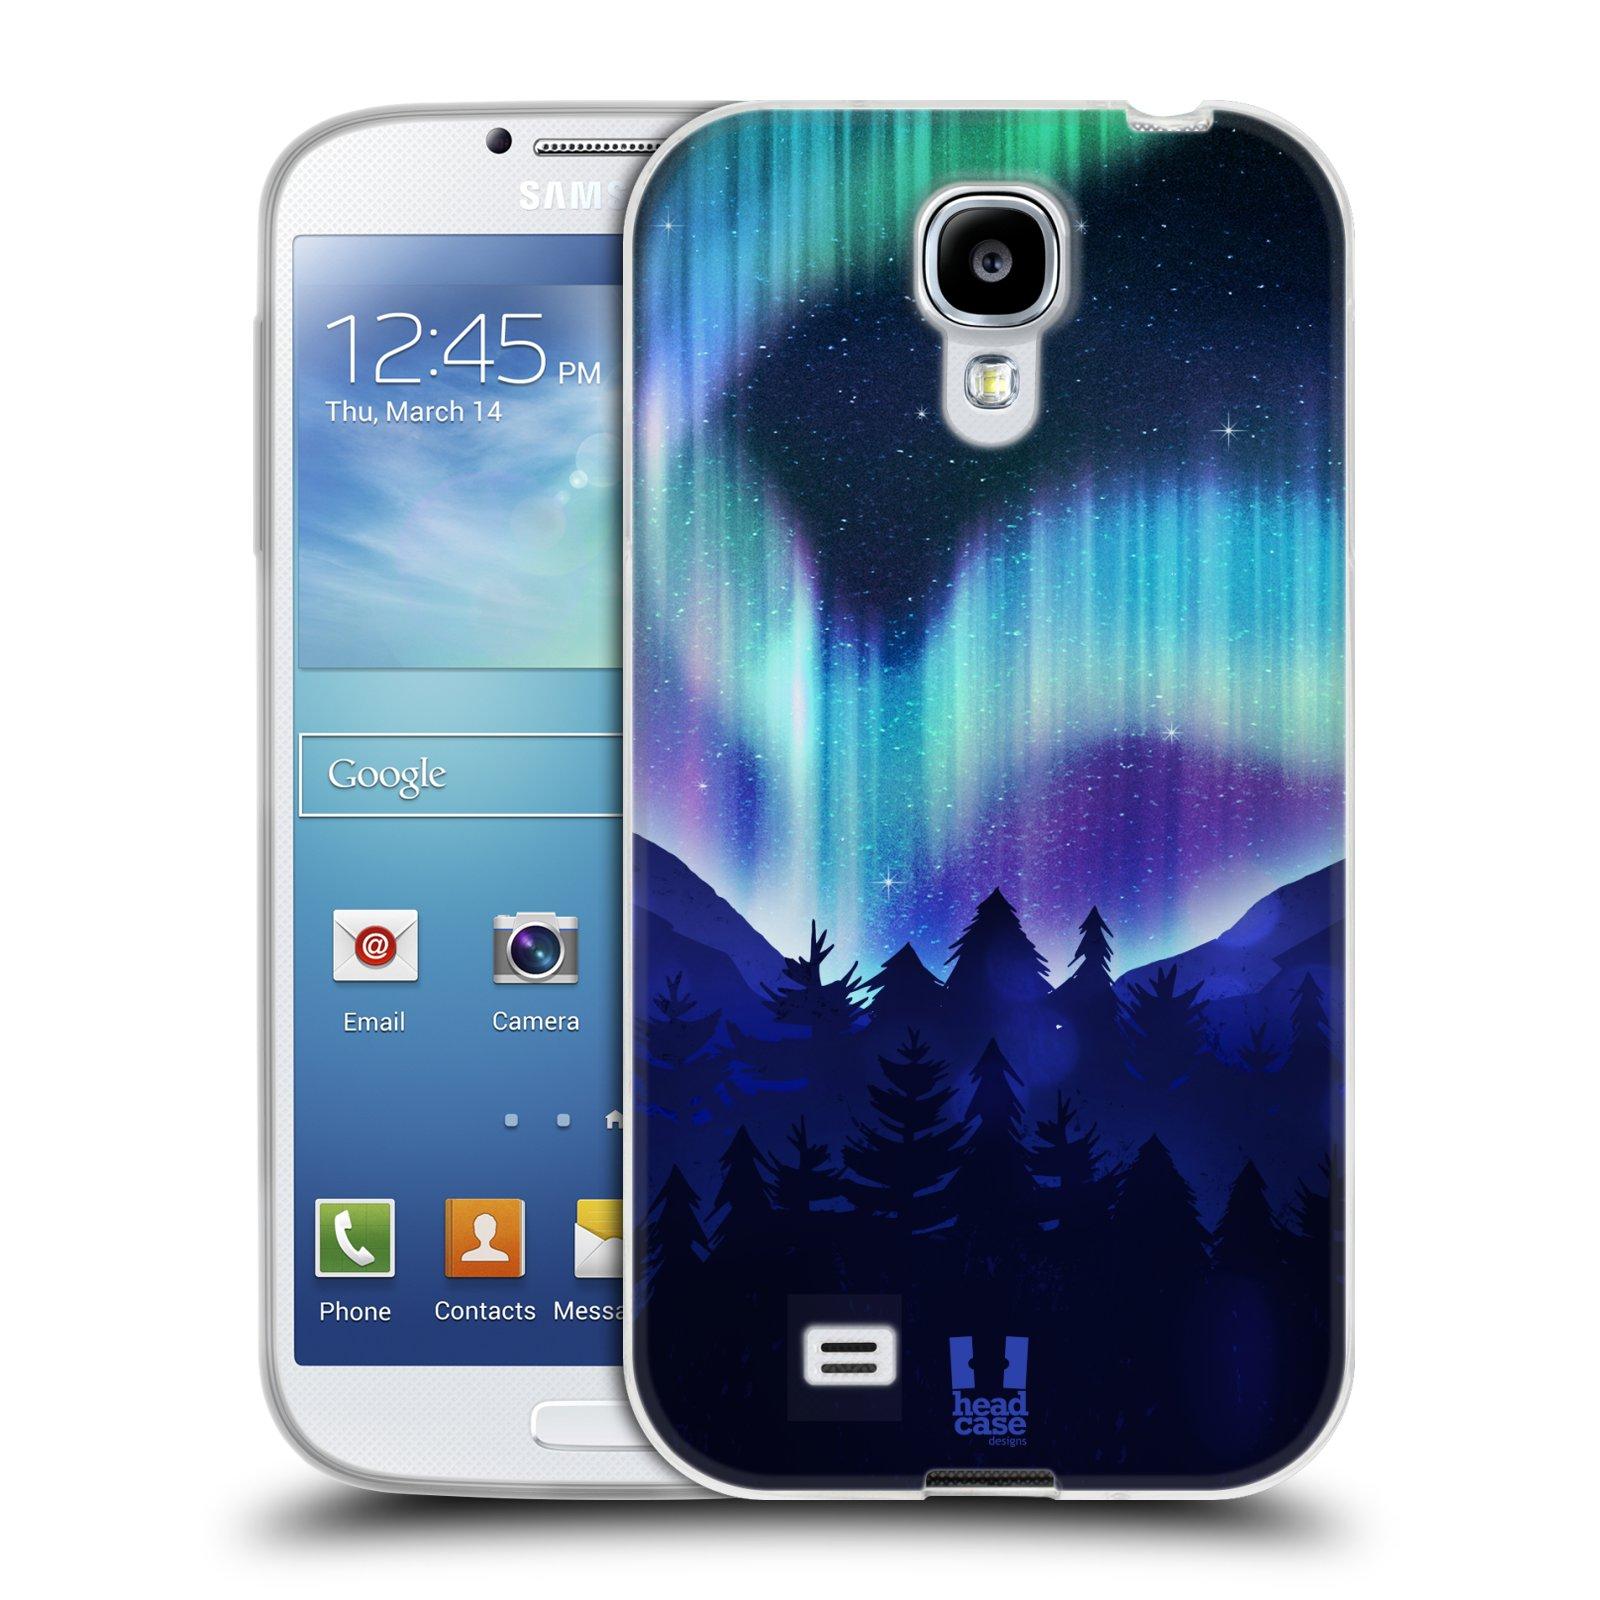 Silikonové pouzdro na mobil Samsung Galaxy S4 HEAD CASE Polární Záře Borovice (Silikonový kryt či obal na mobilní telefon Samsung Galaxy S4 GT-i9505 / i9500)